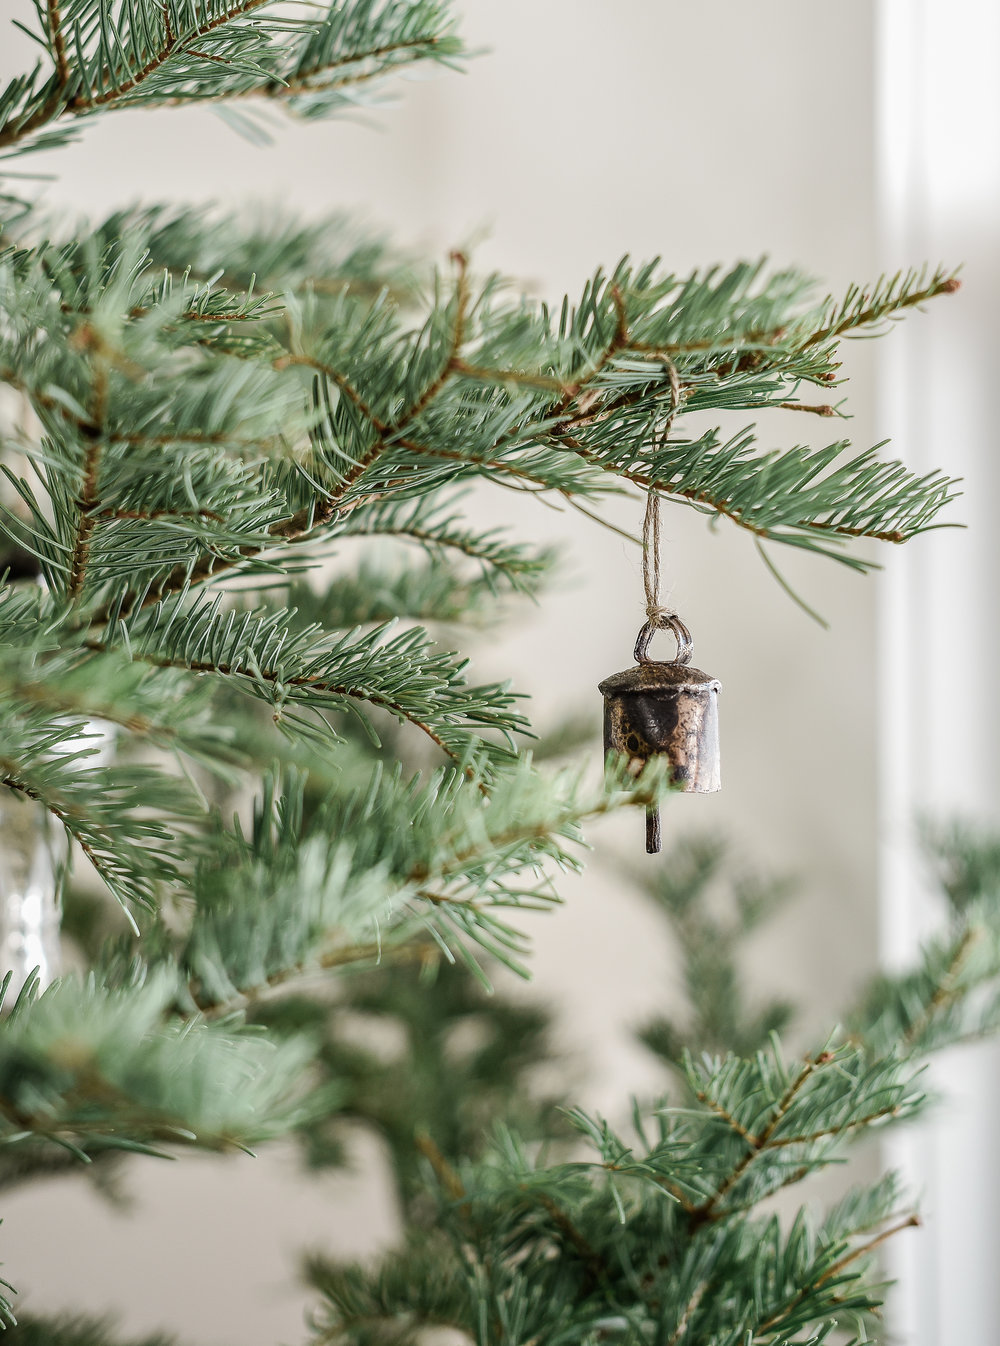 Beautiful farmhouse Christmas decor with Vintage Christmas Decorations on minimal live tree from boxwoodavenue.com | #farmhousechristmas #christmasdecorating